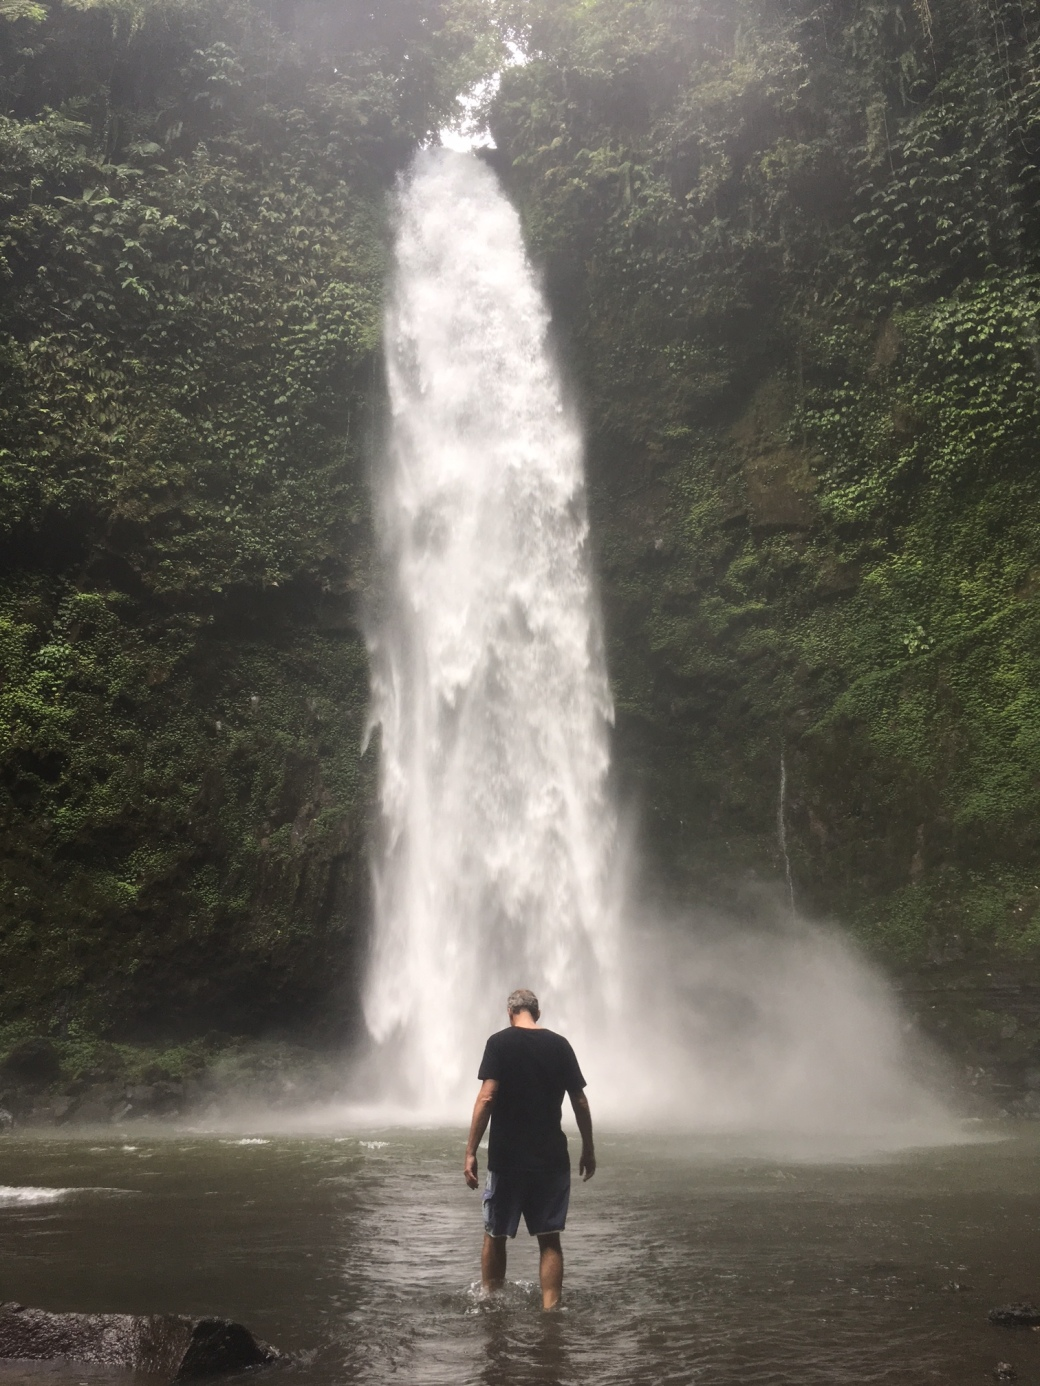 bali-waterfall-walking-away-nov-2016